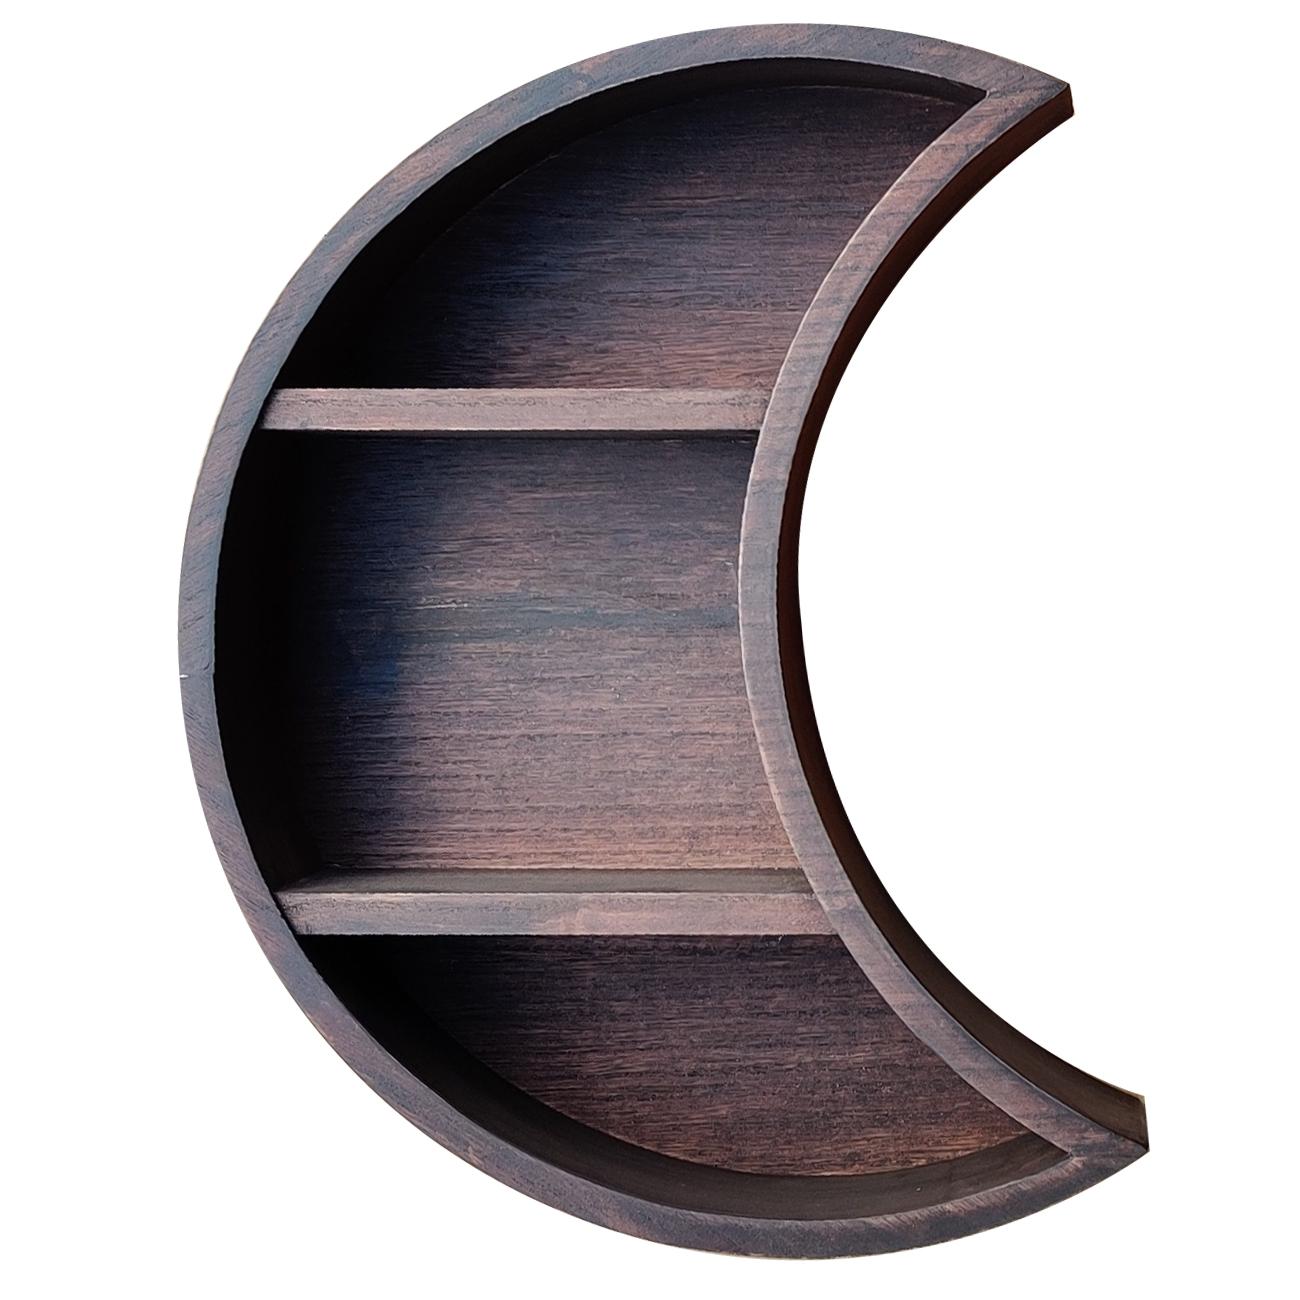 Wall Mounted Moon Shelf Wooden Floating Shelves Hanging Storage Display Shelf Wall Decor for Living Room Bedroom